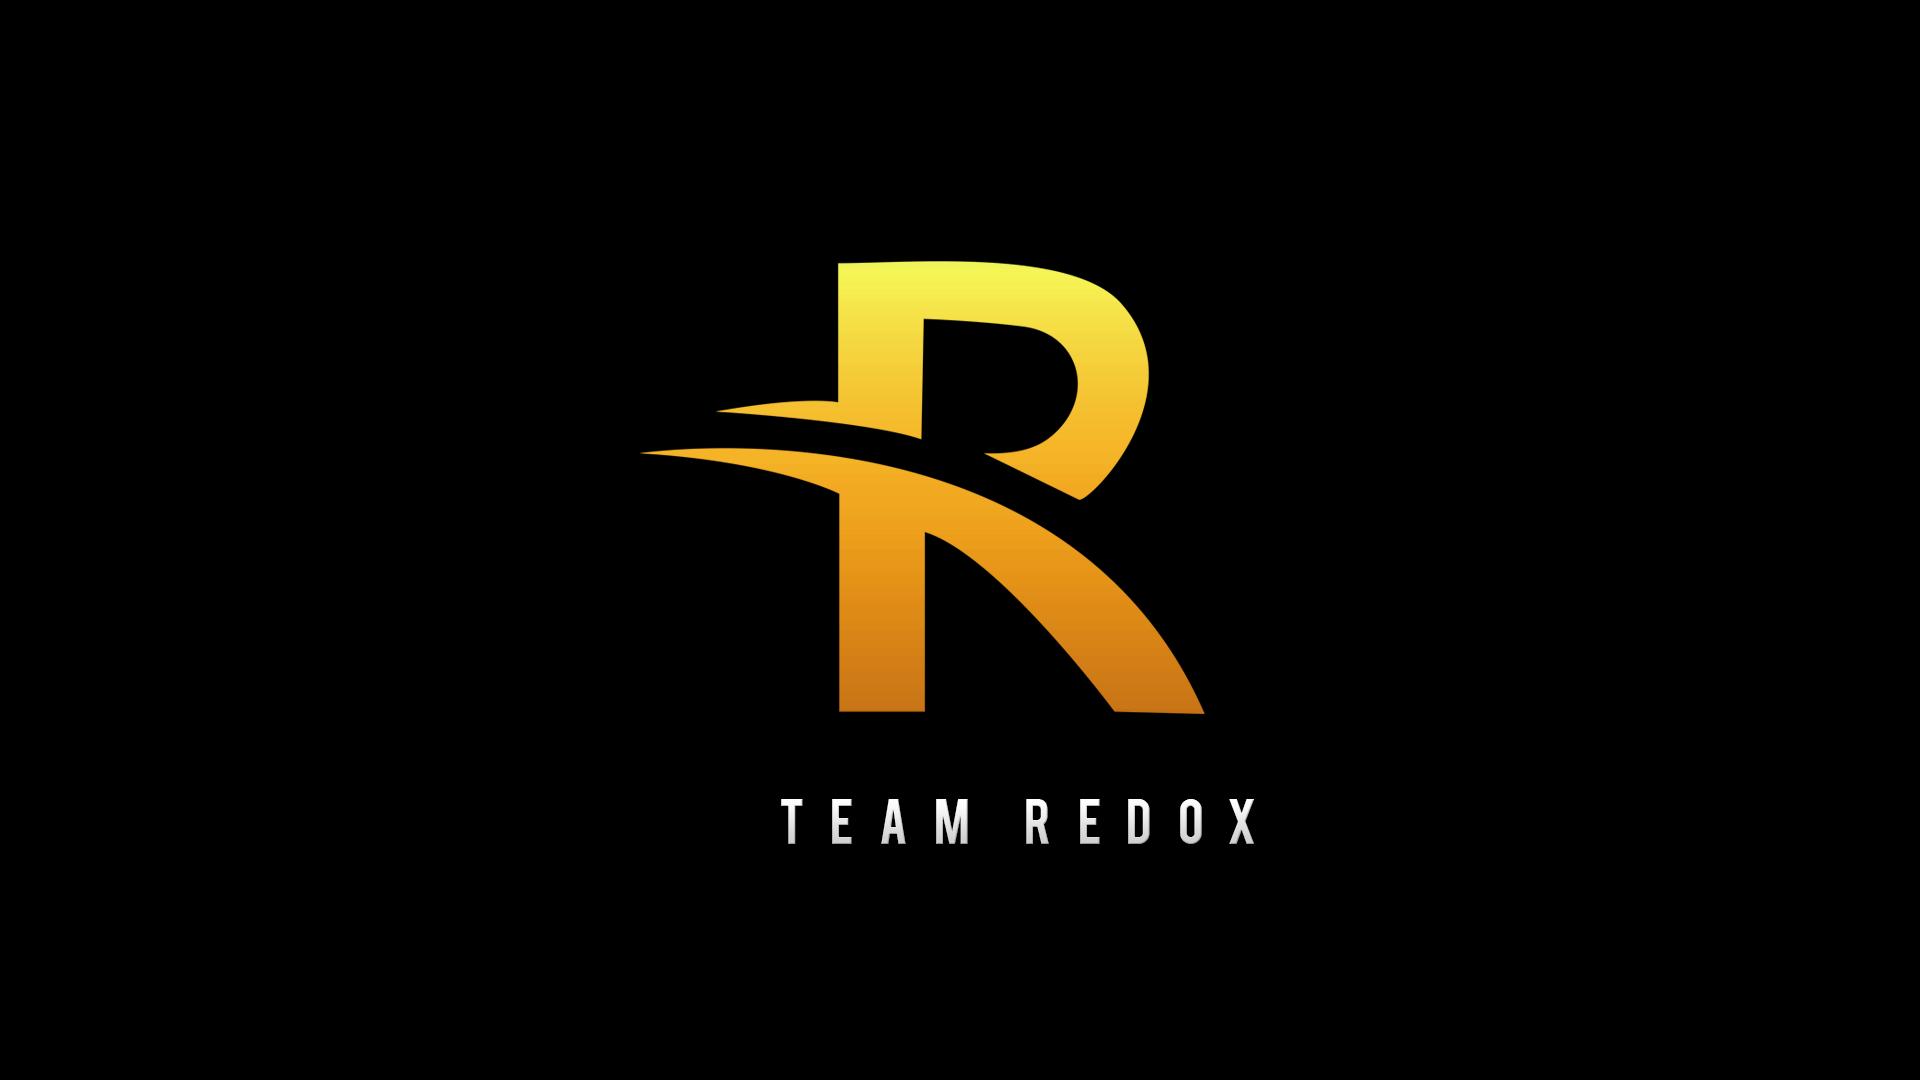 Team Redox